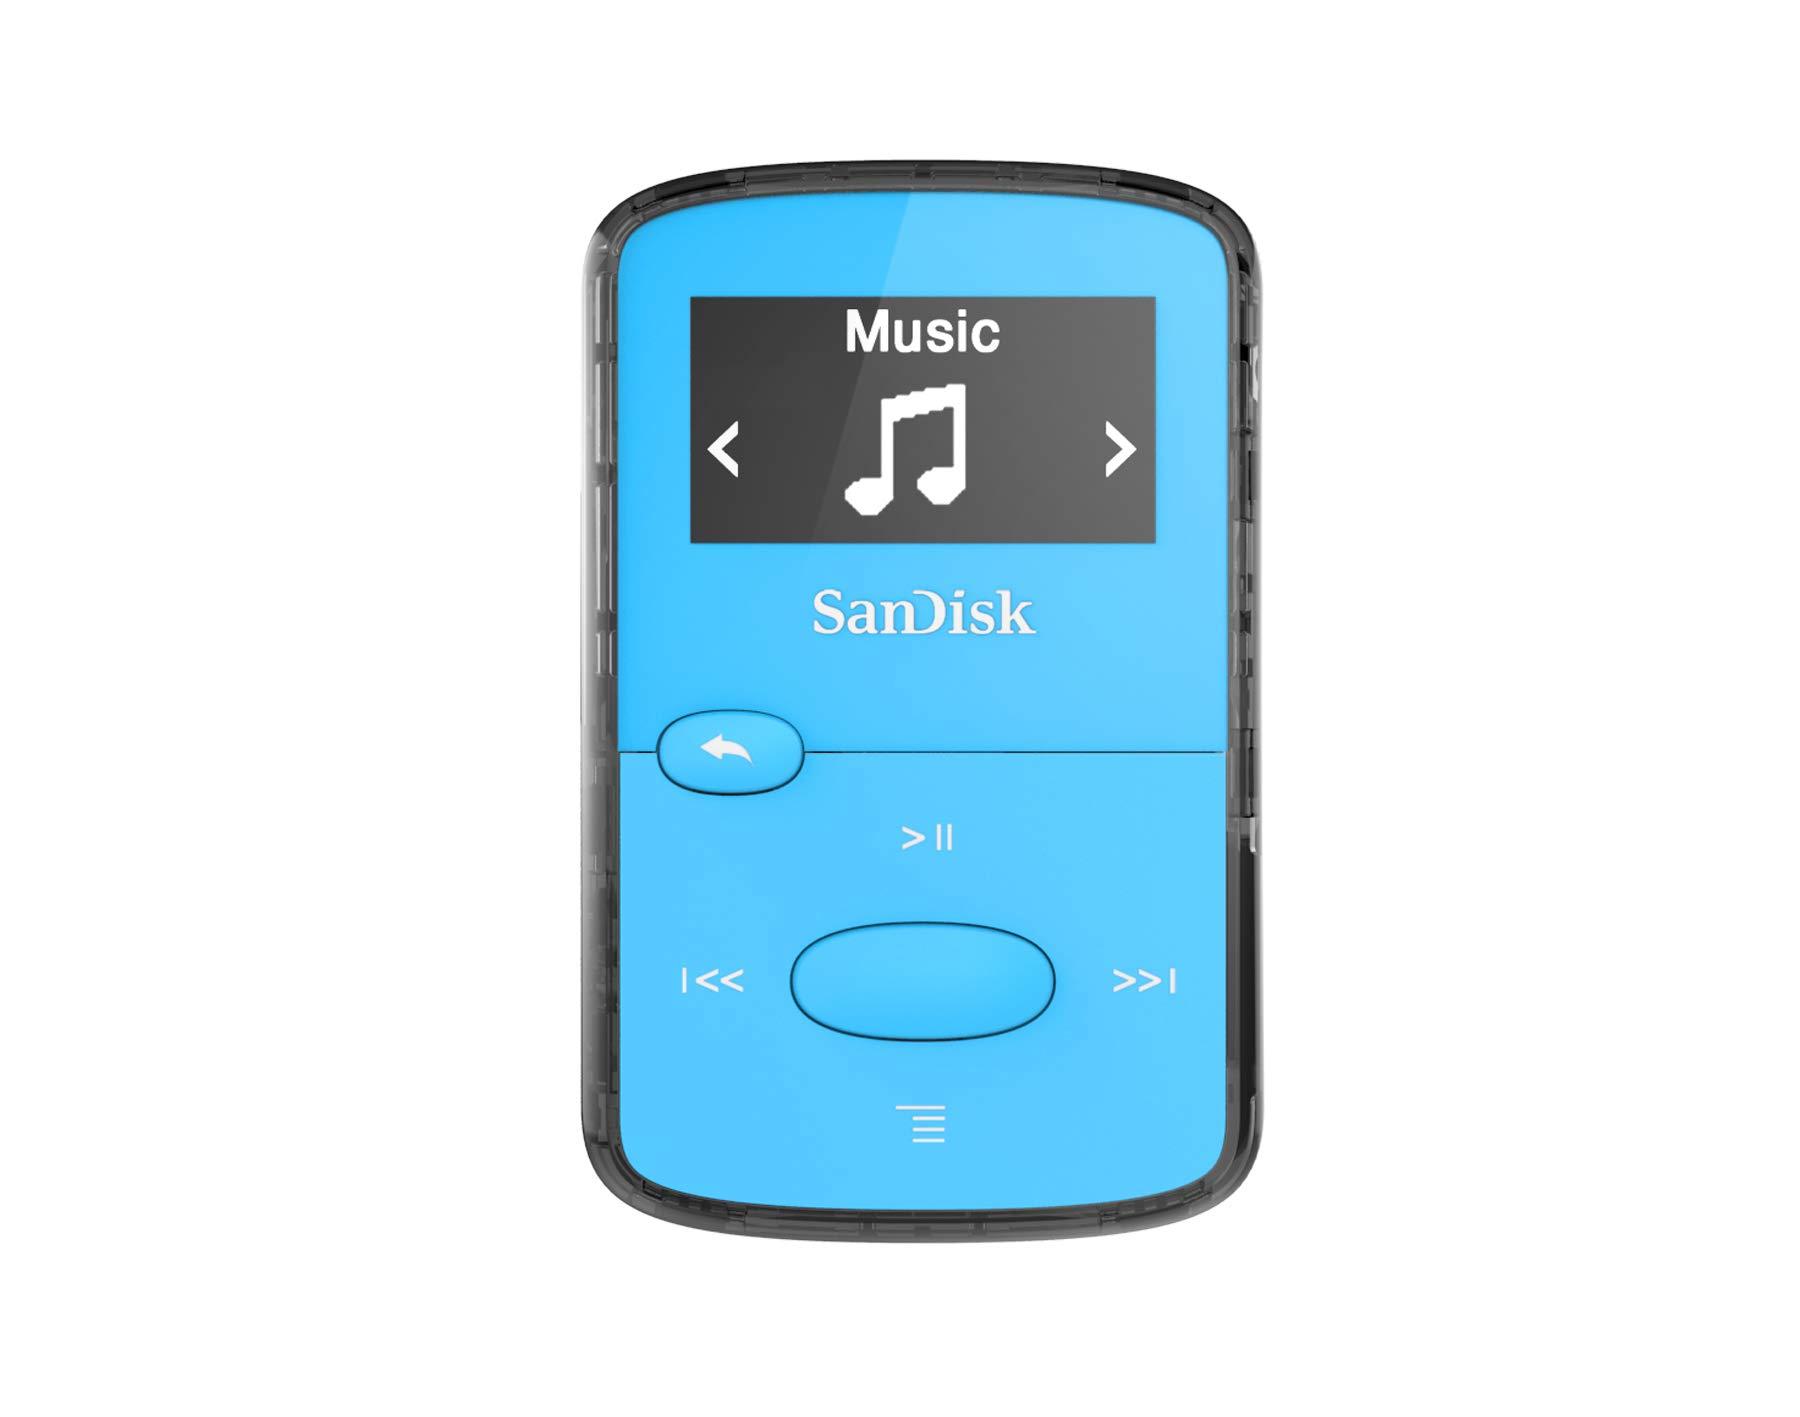 SanDisk 8GB Clip Player Blue